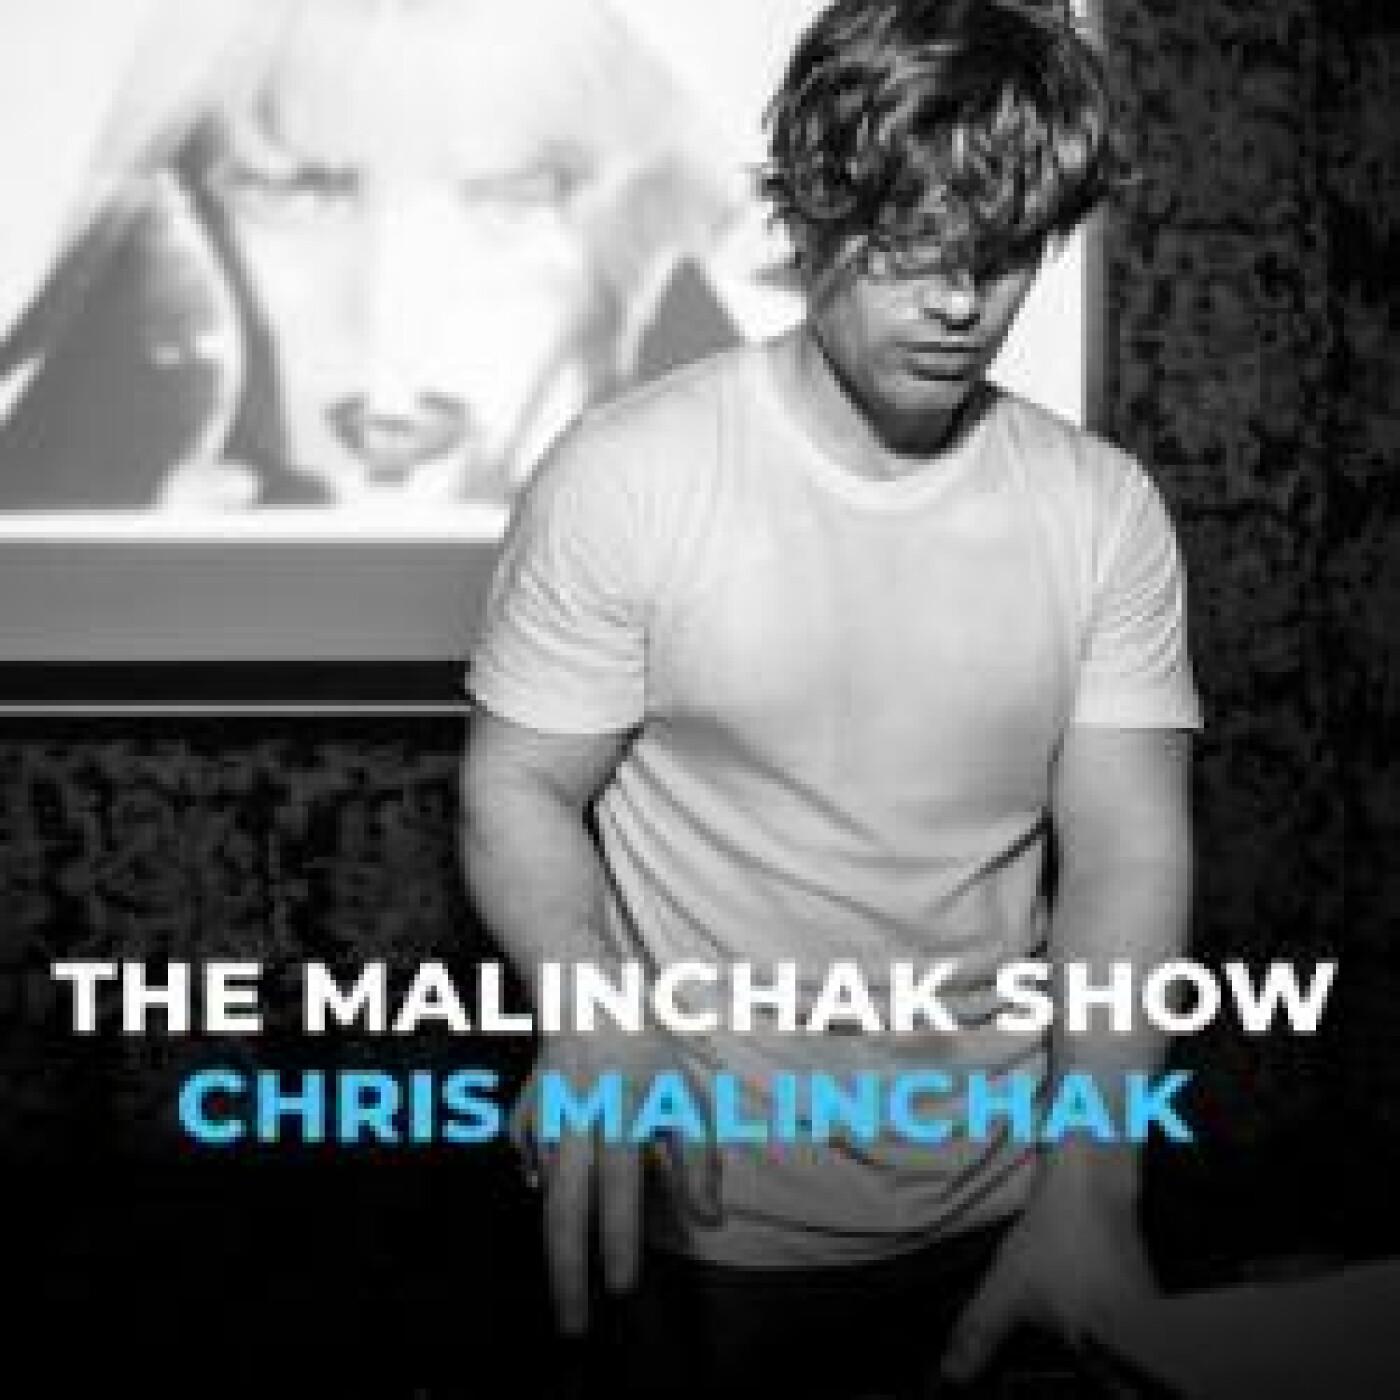 THE MALINCHAK SHOW DU 16 JUIN 2021